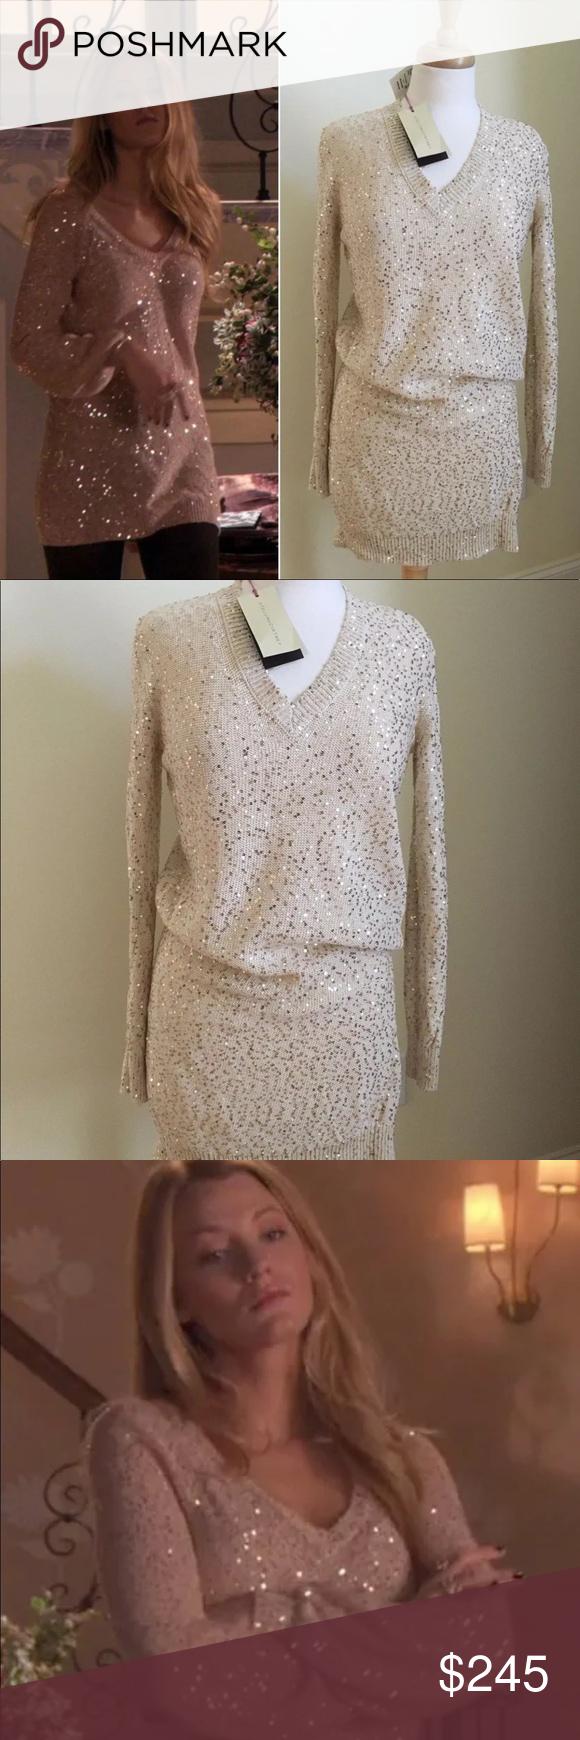 52f9f81032 Stella McCartney gold sequin dress 2 4 Gossip Girl Hey upper east siders!  For sale